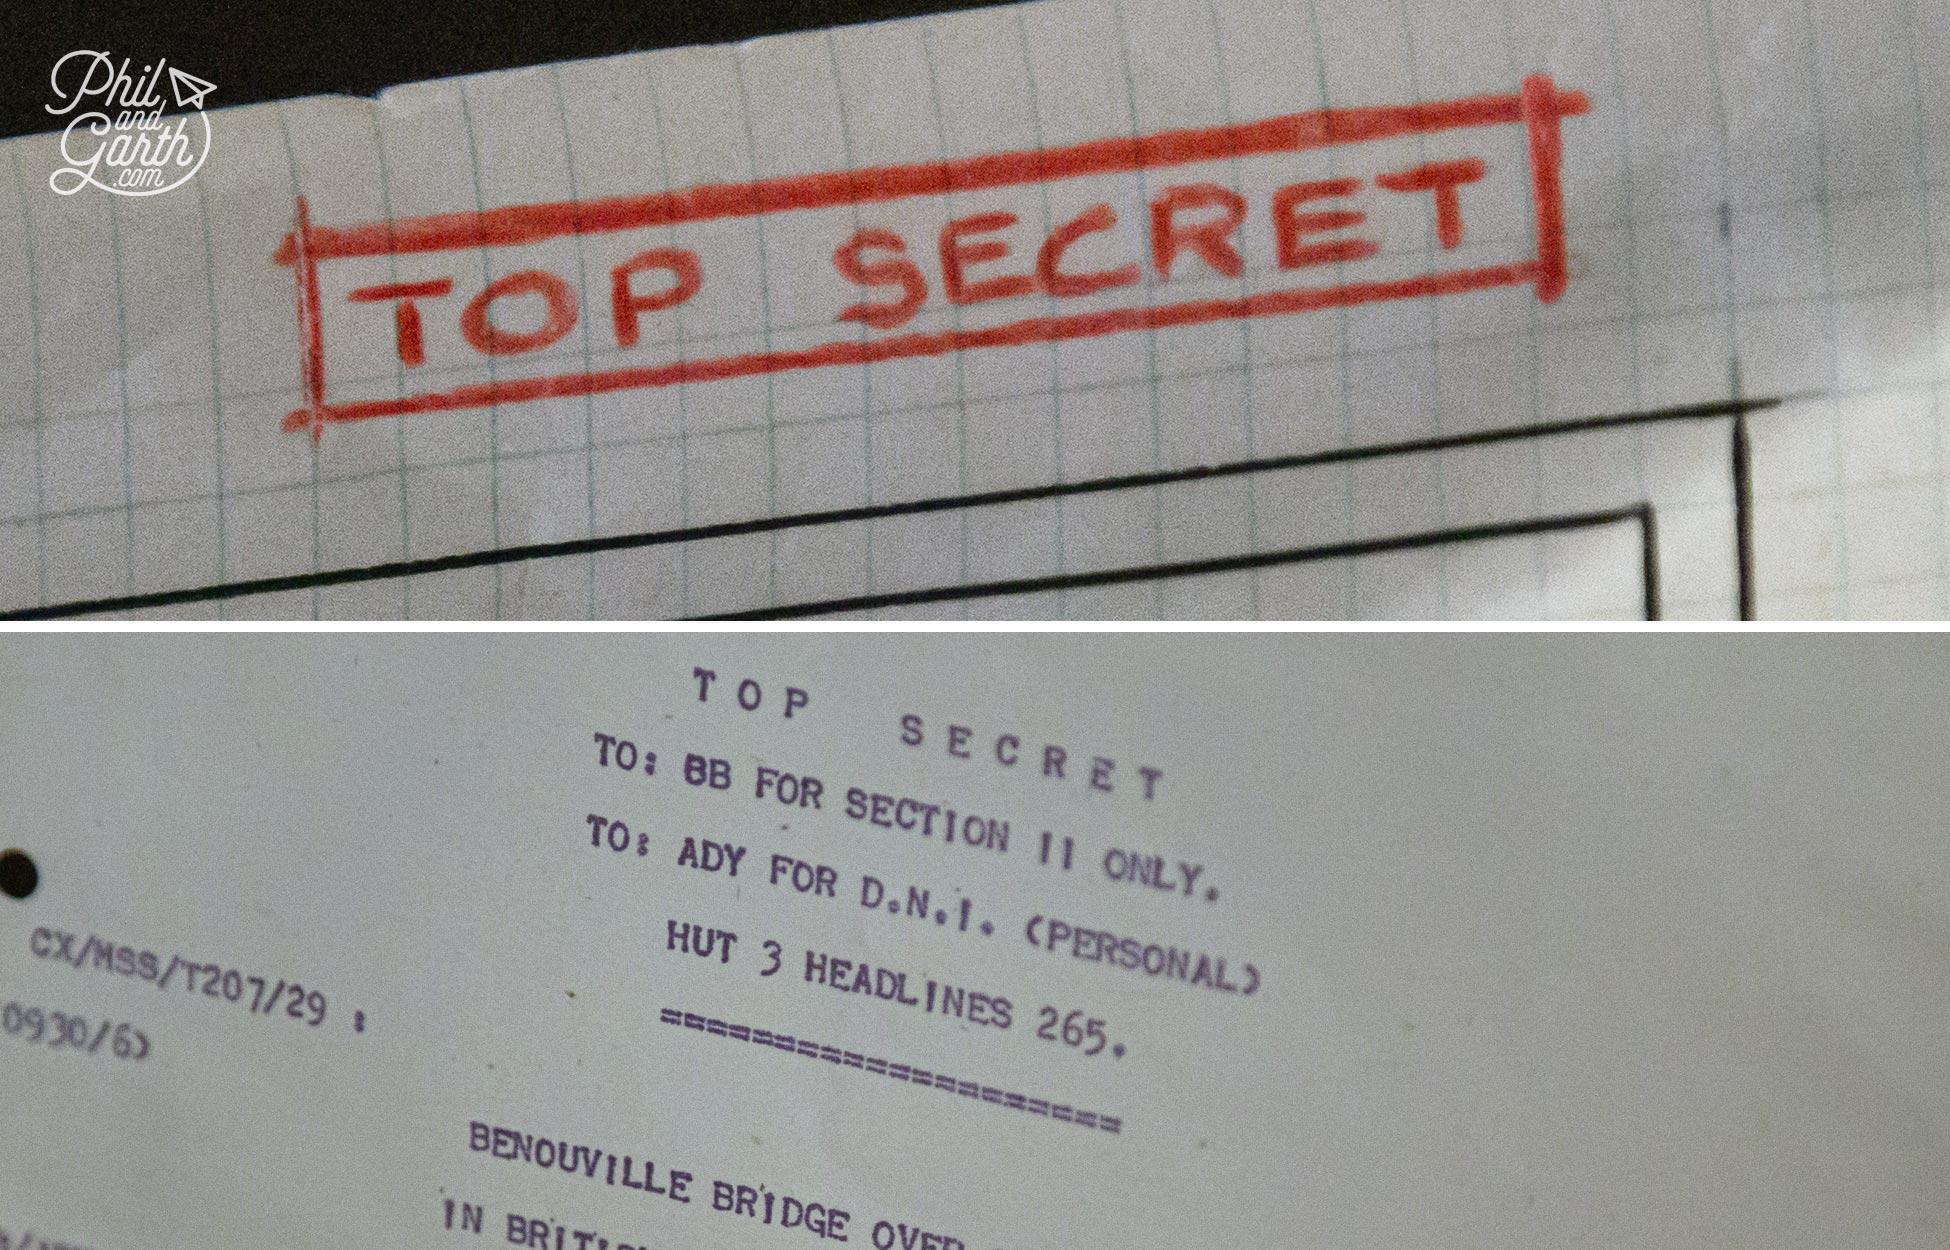 Top secret intelligence